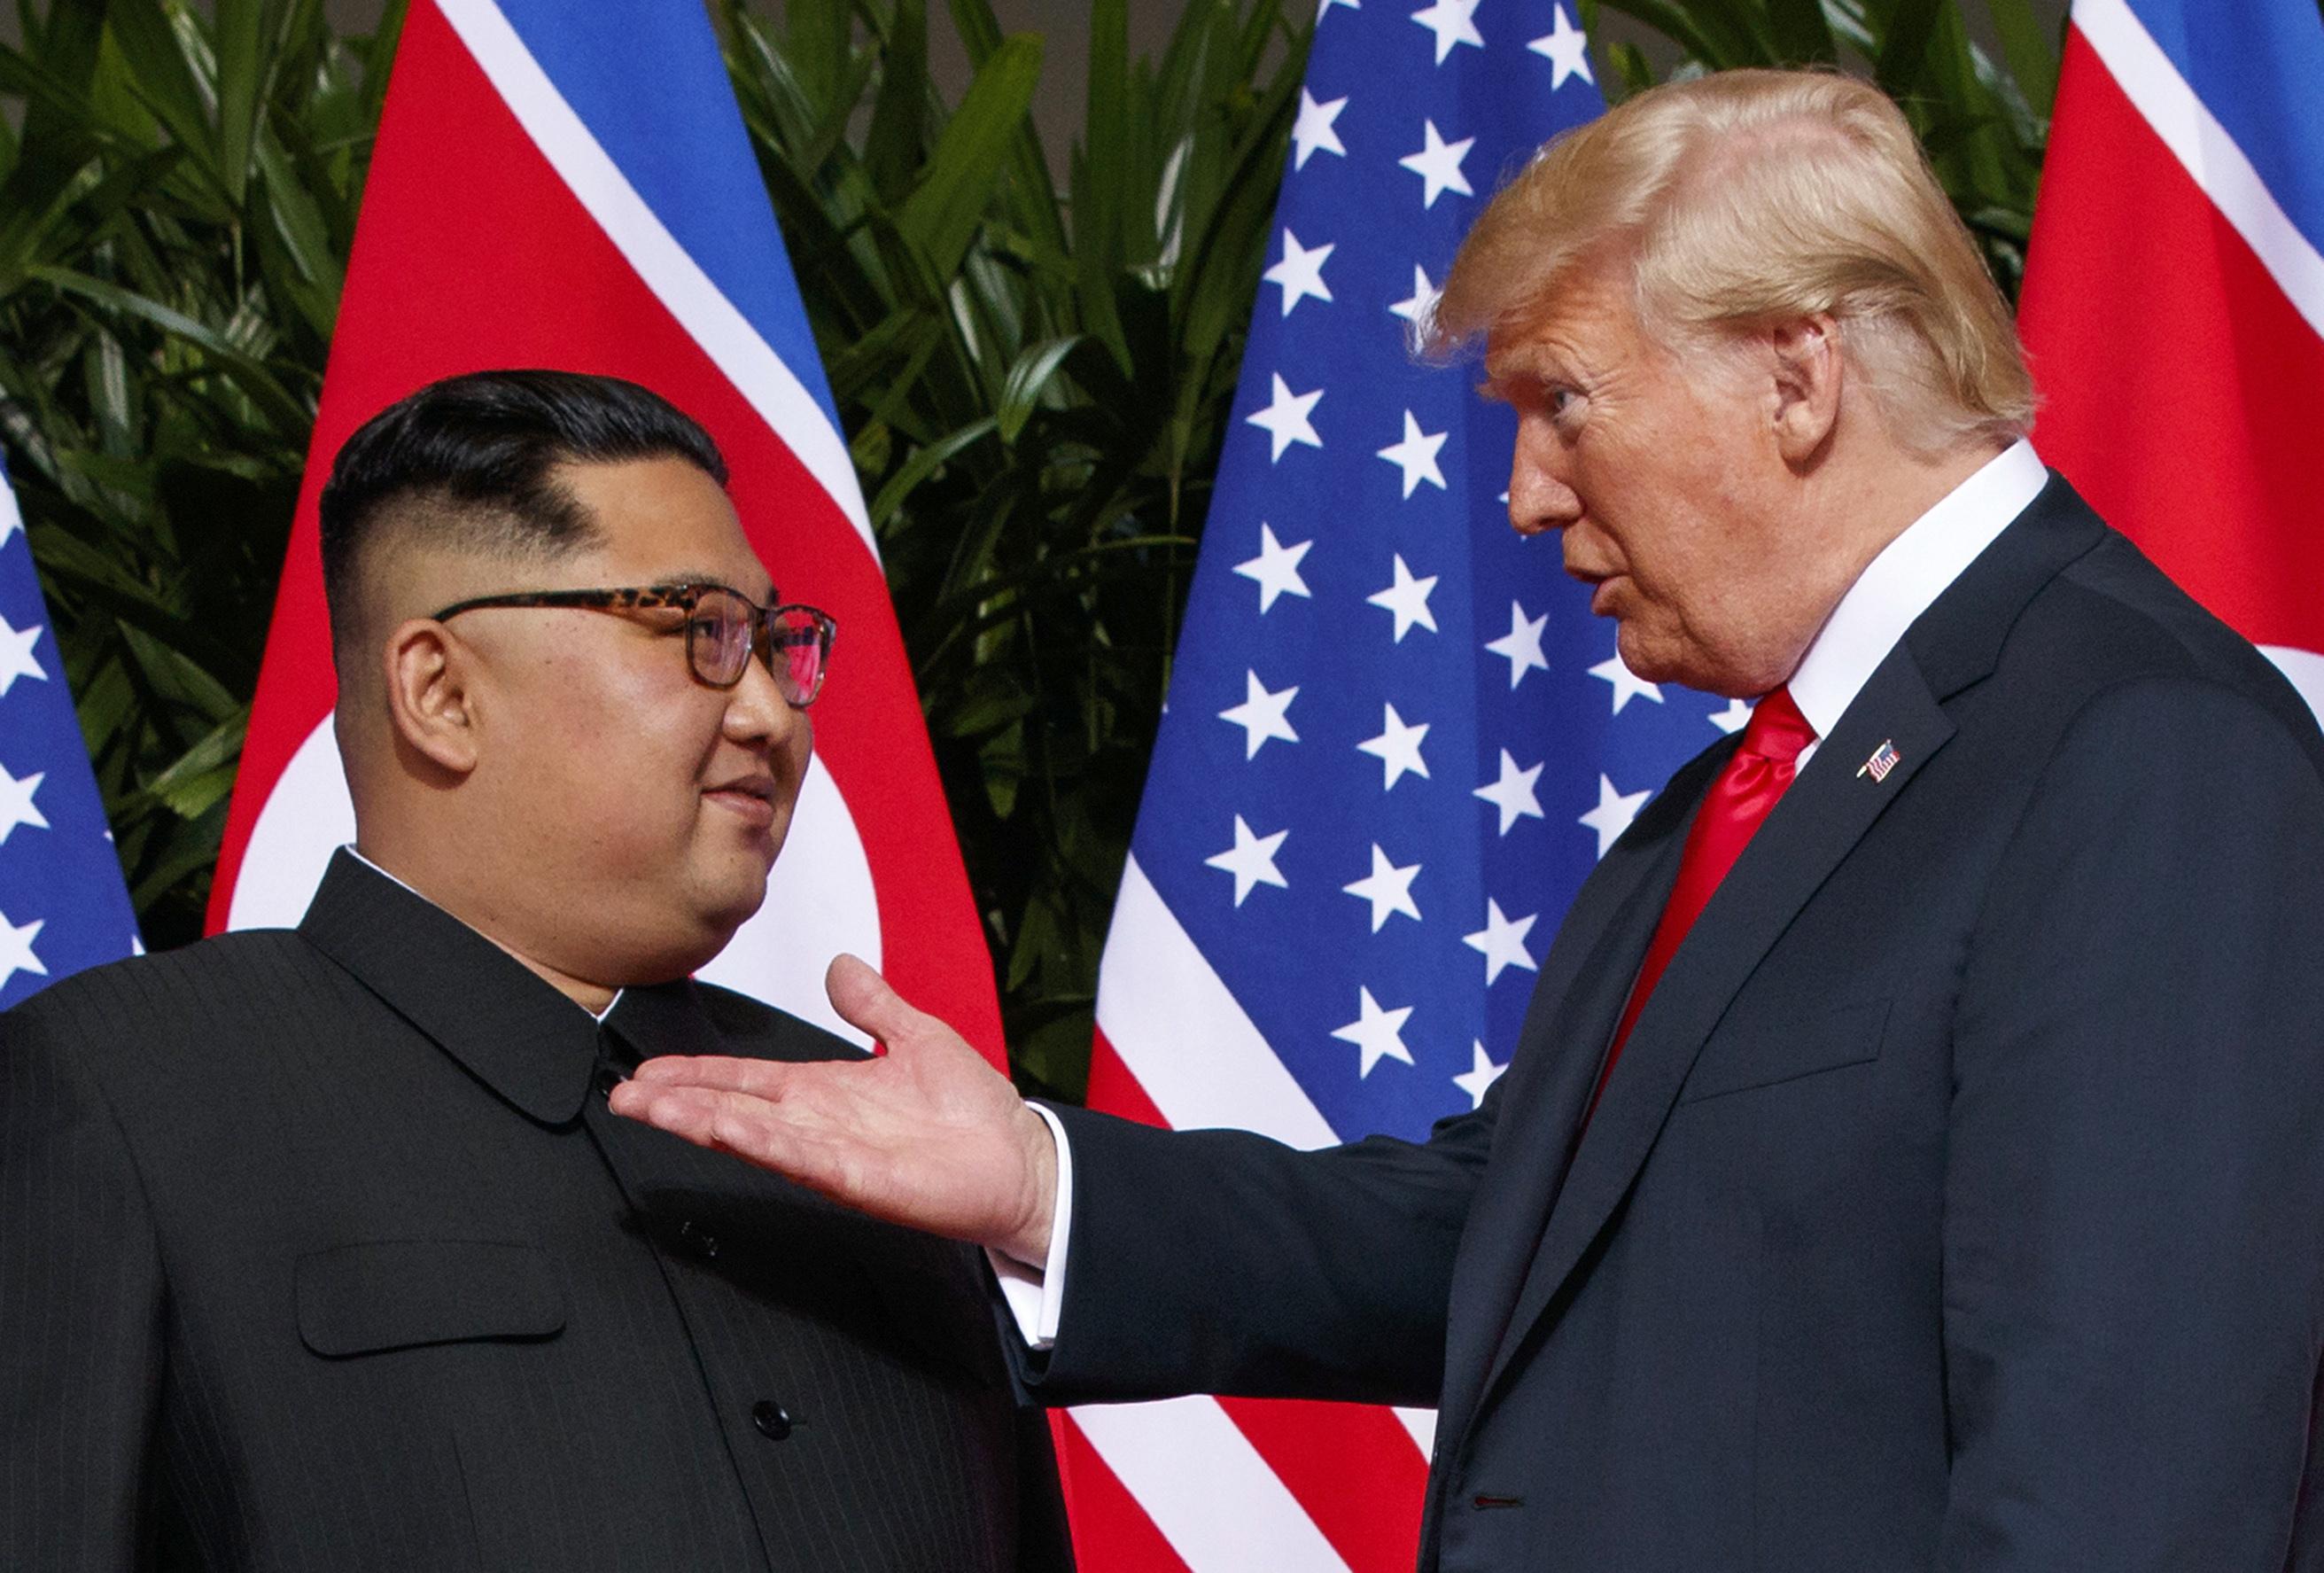 Trump says North Korea no longer 'nuclear threat'